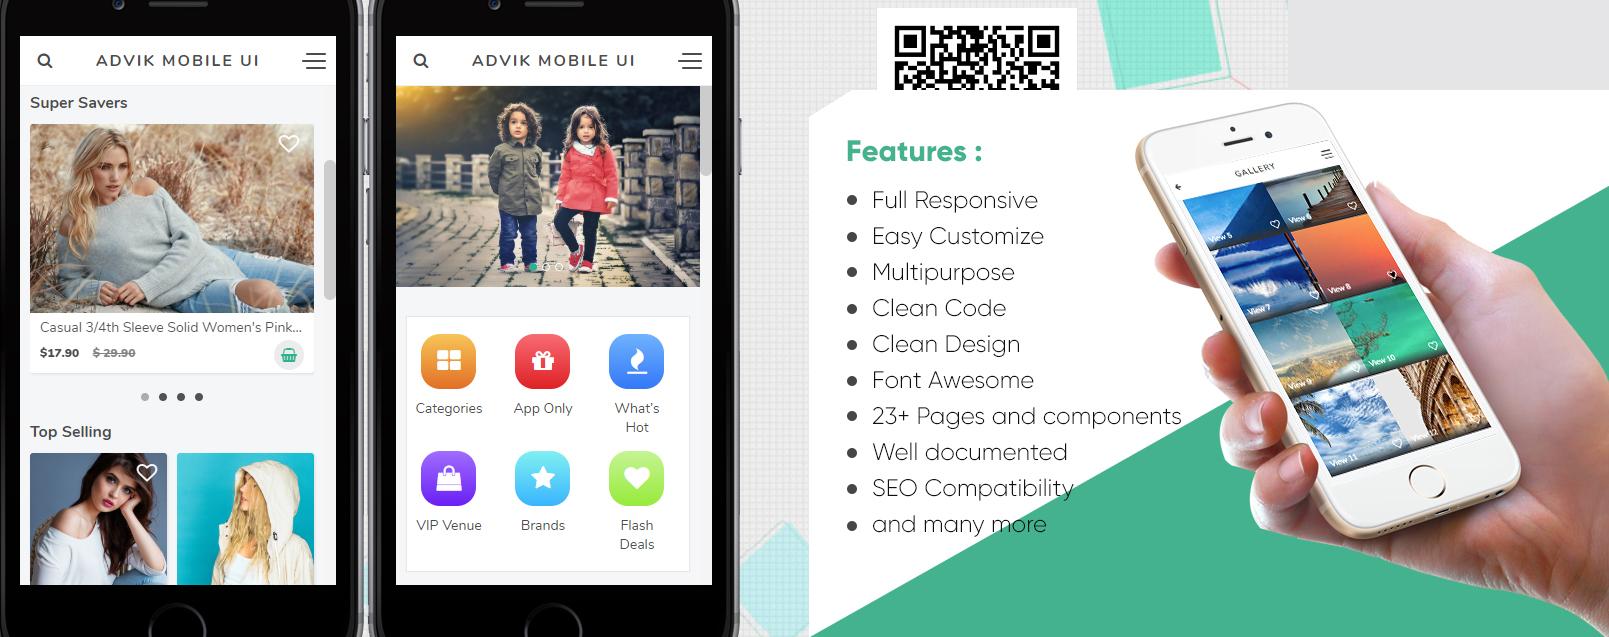 ADVIK Premium Web Mobile UI Kit App